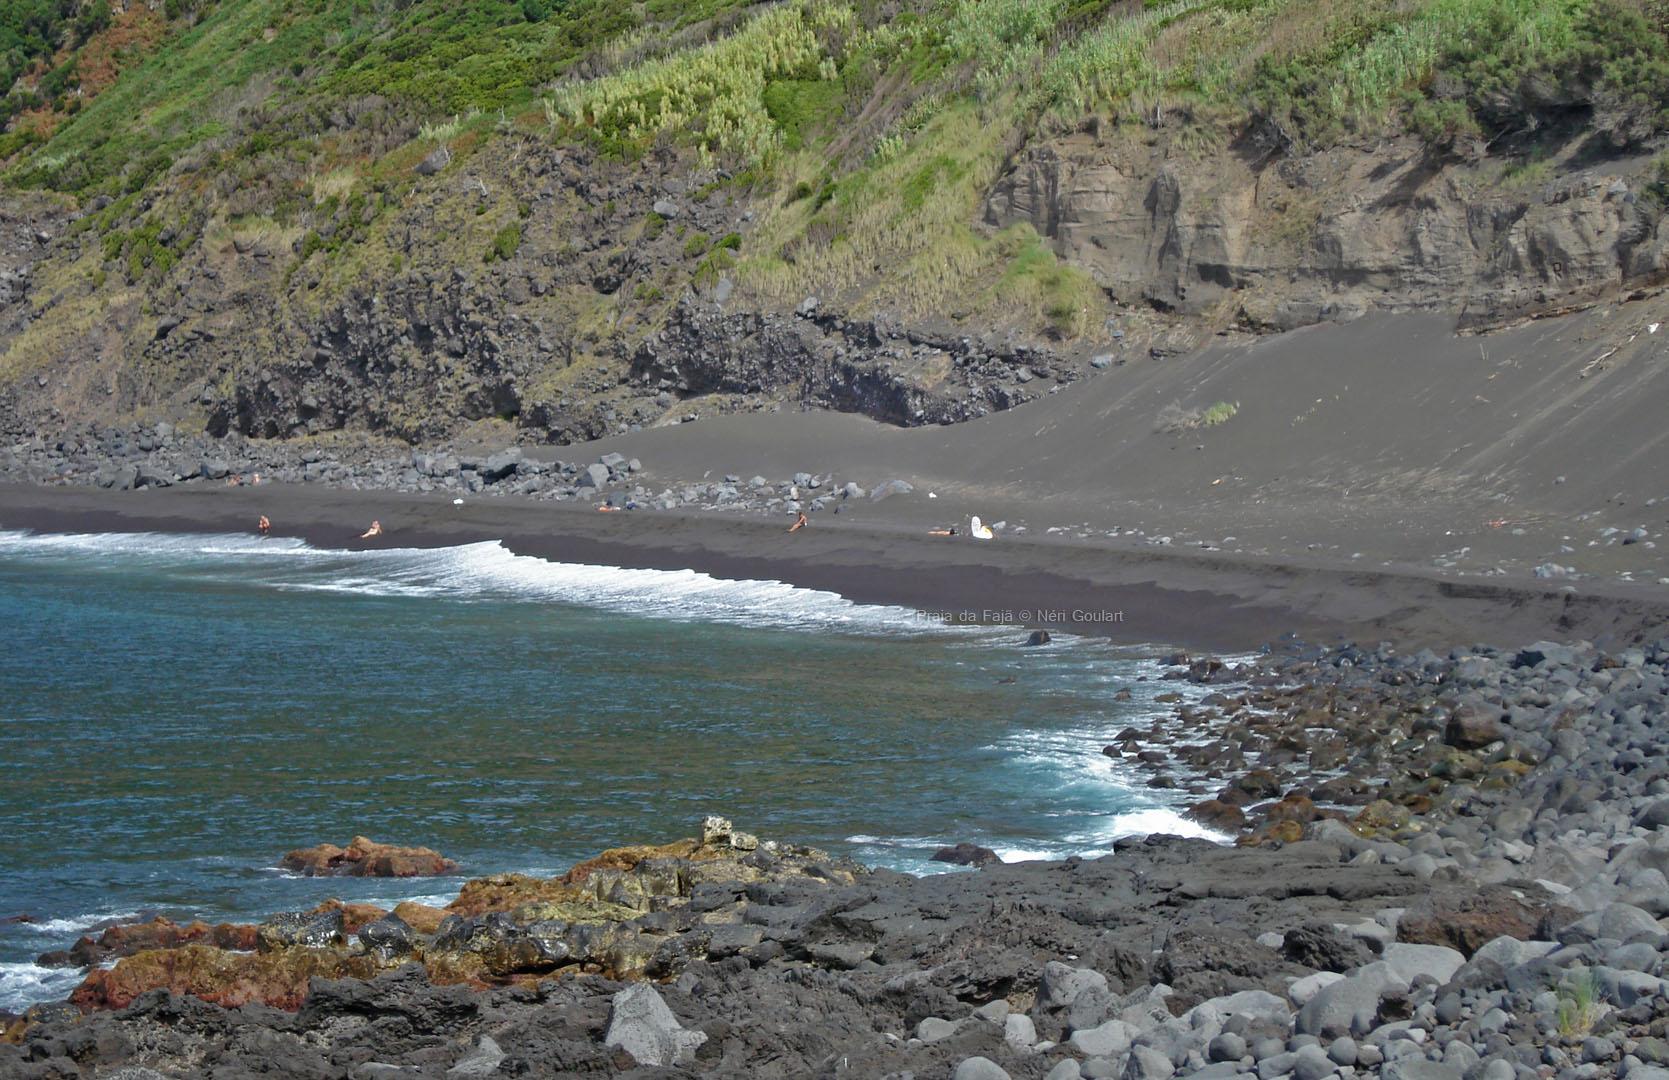 Praia da Fajã - Ilha do Faial, Açores